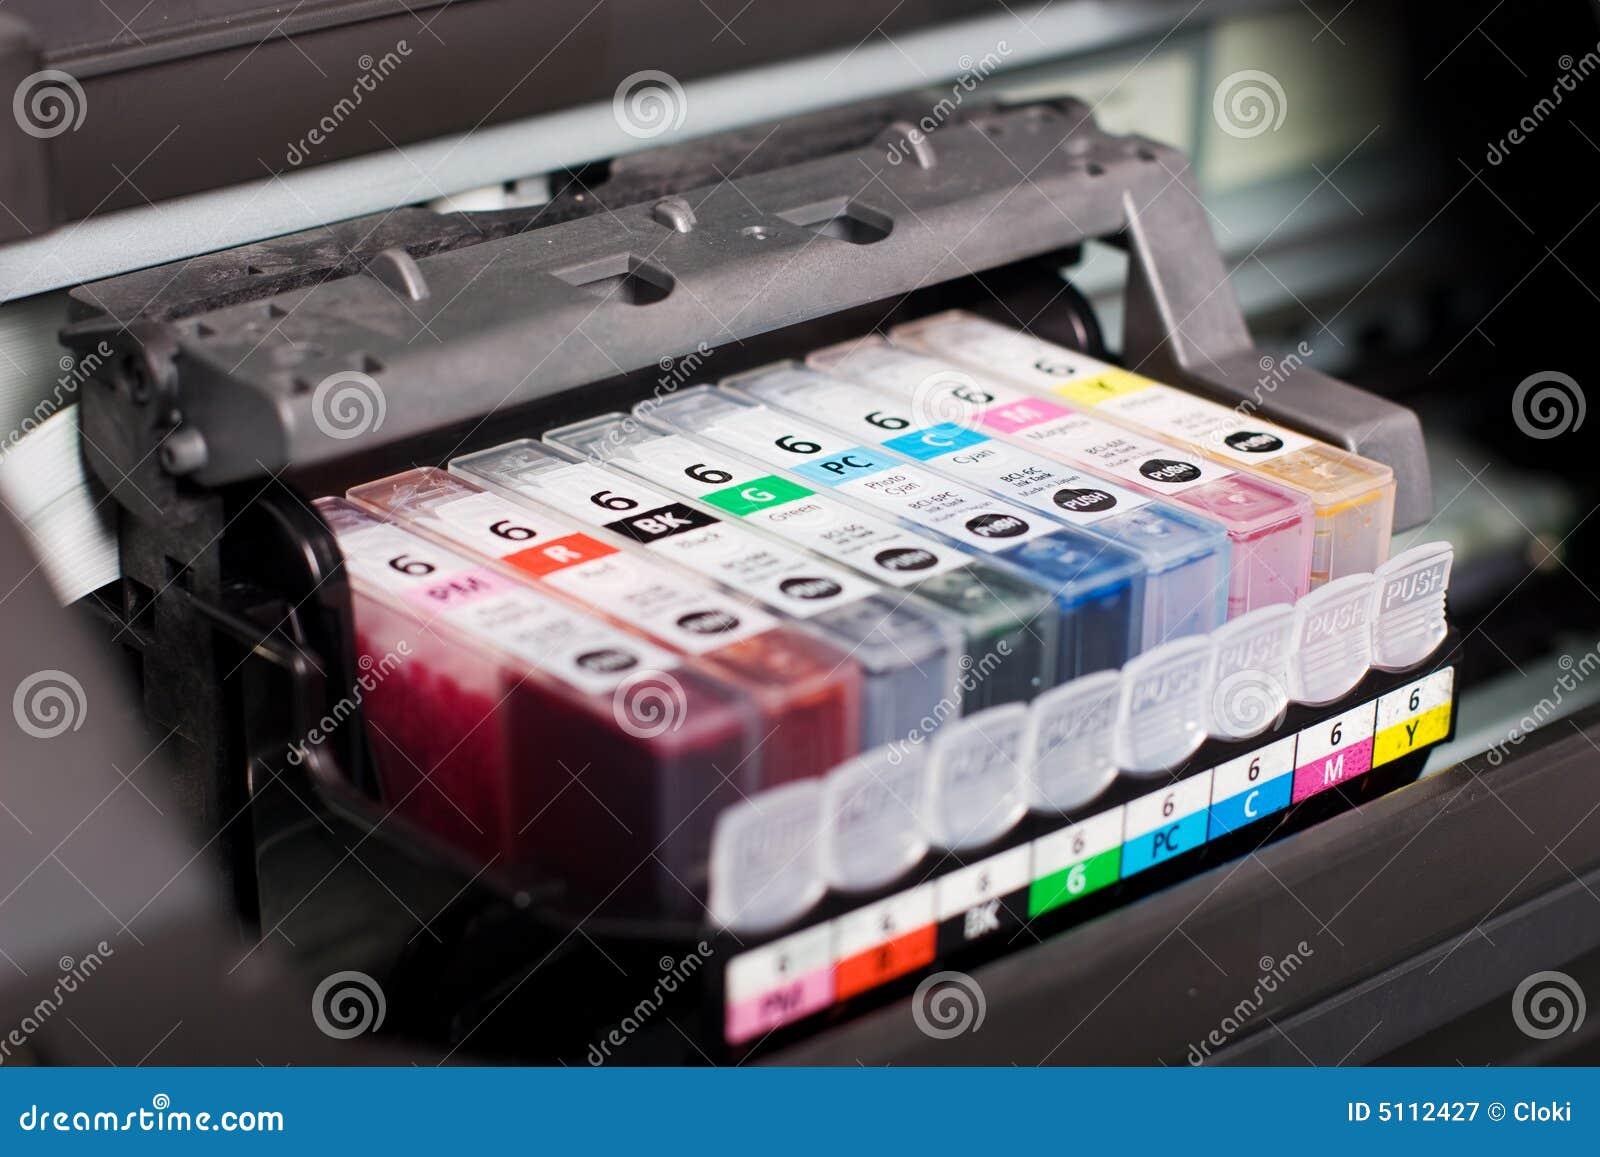 Как заправить картридж HP 650, HP 85